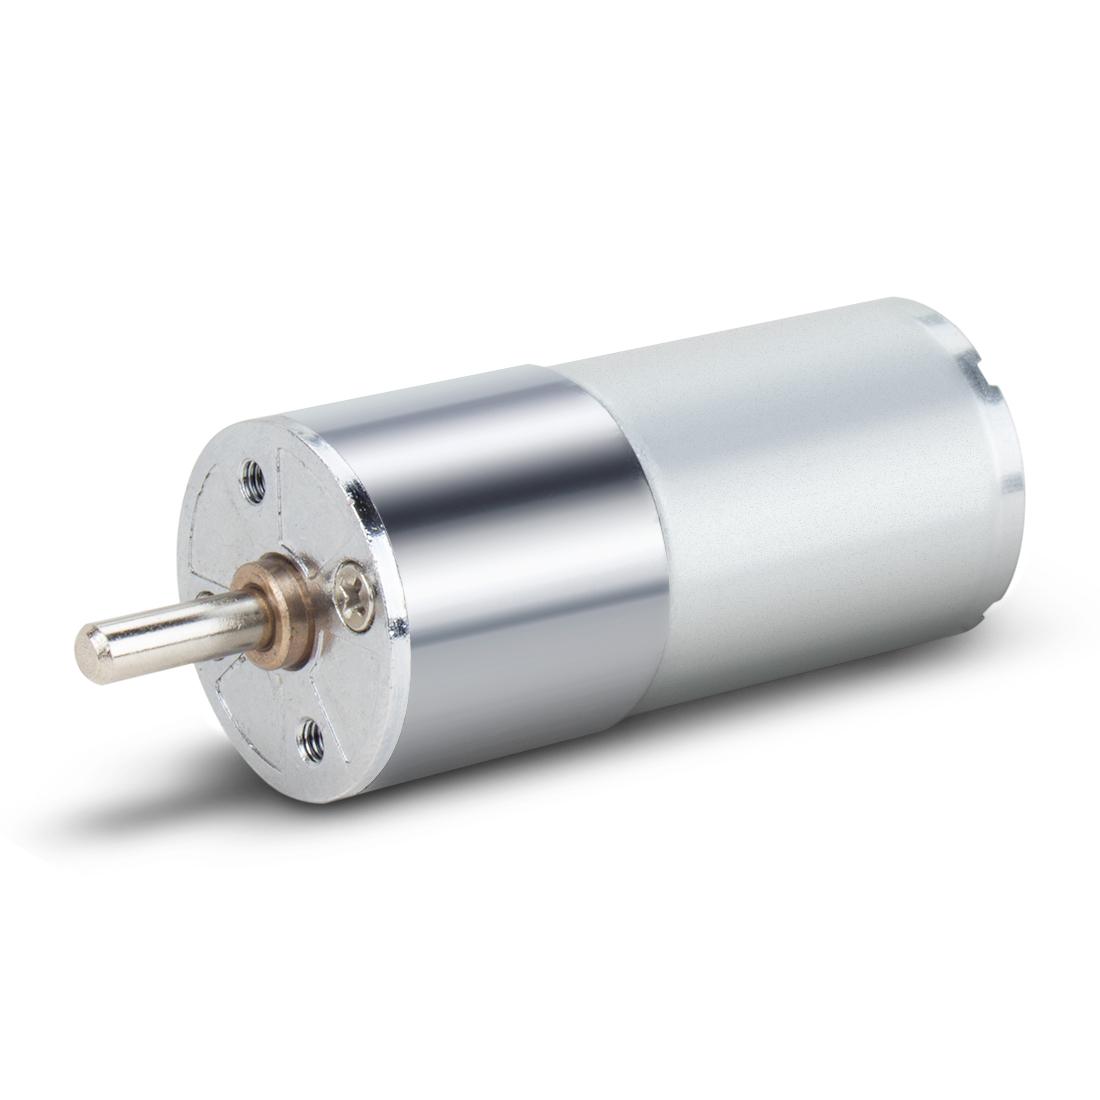 ZGA25RP DC 12V 80RPM Micro Gear Box Motor Speed Reduction Centric Output Shaft